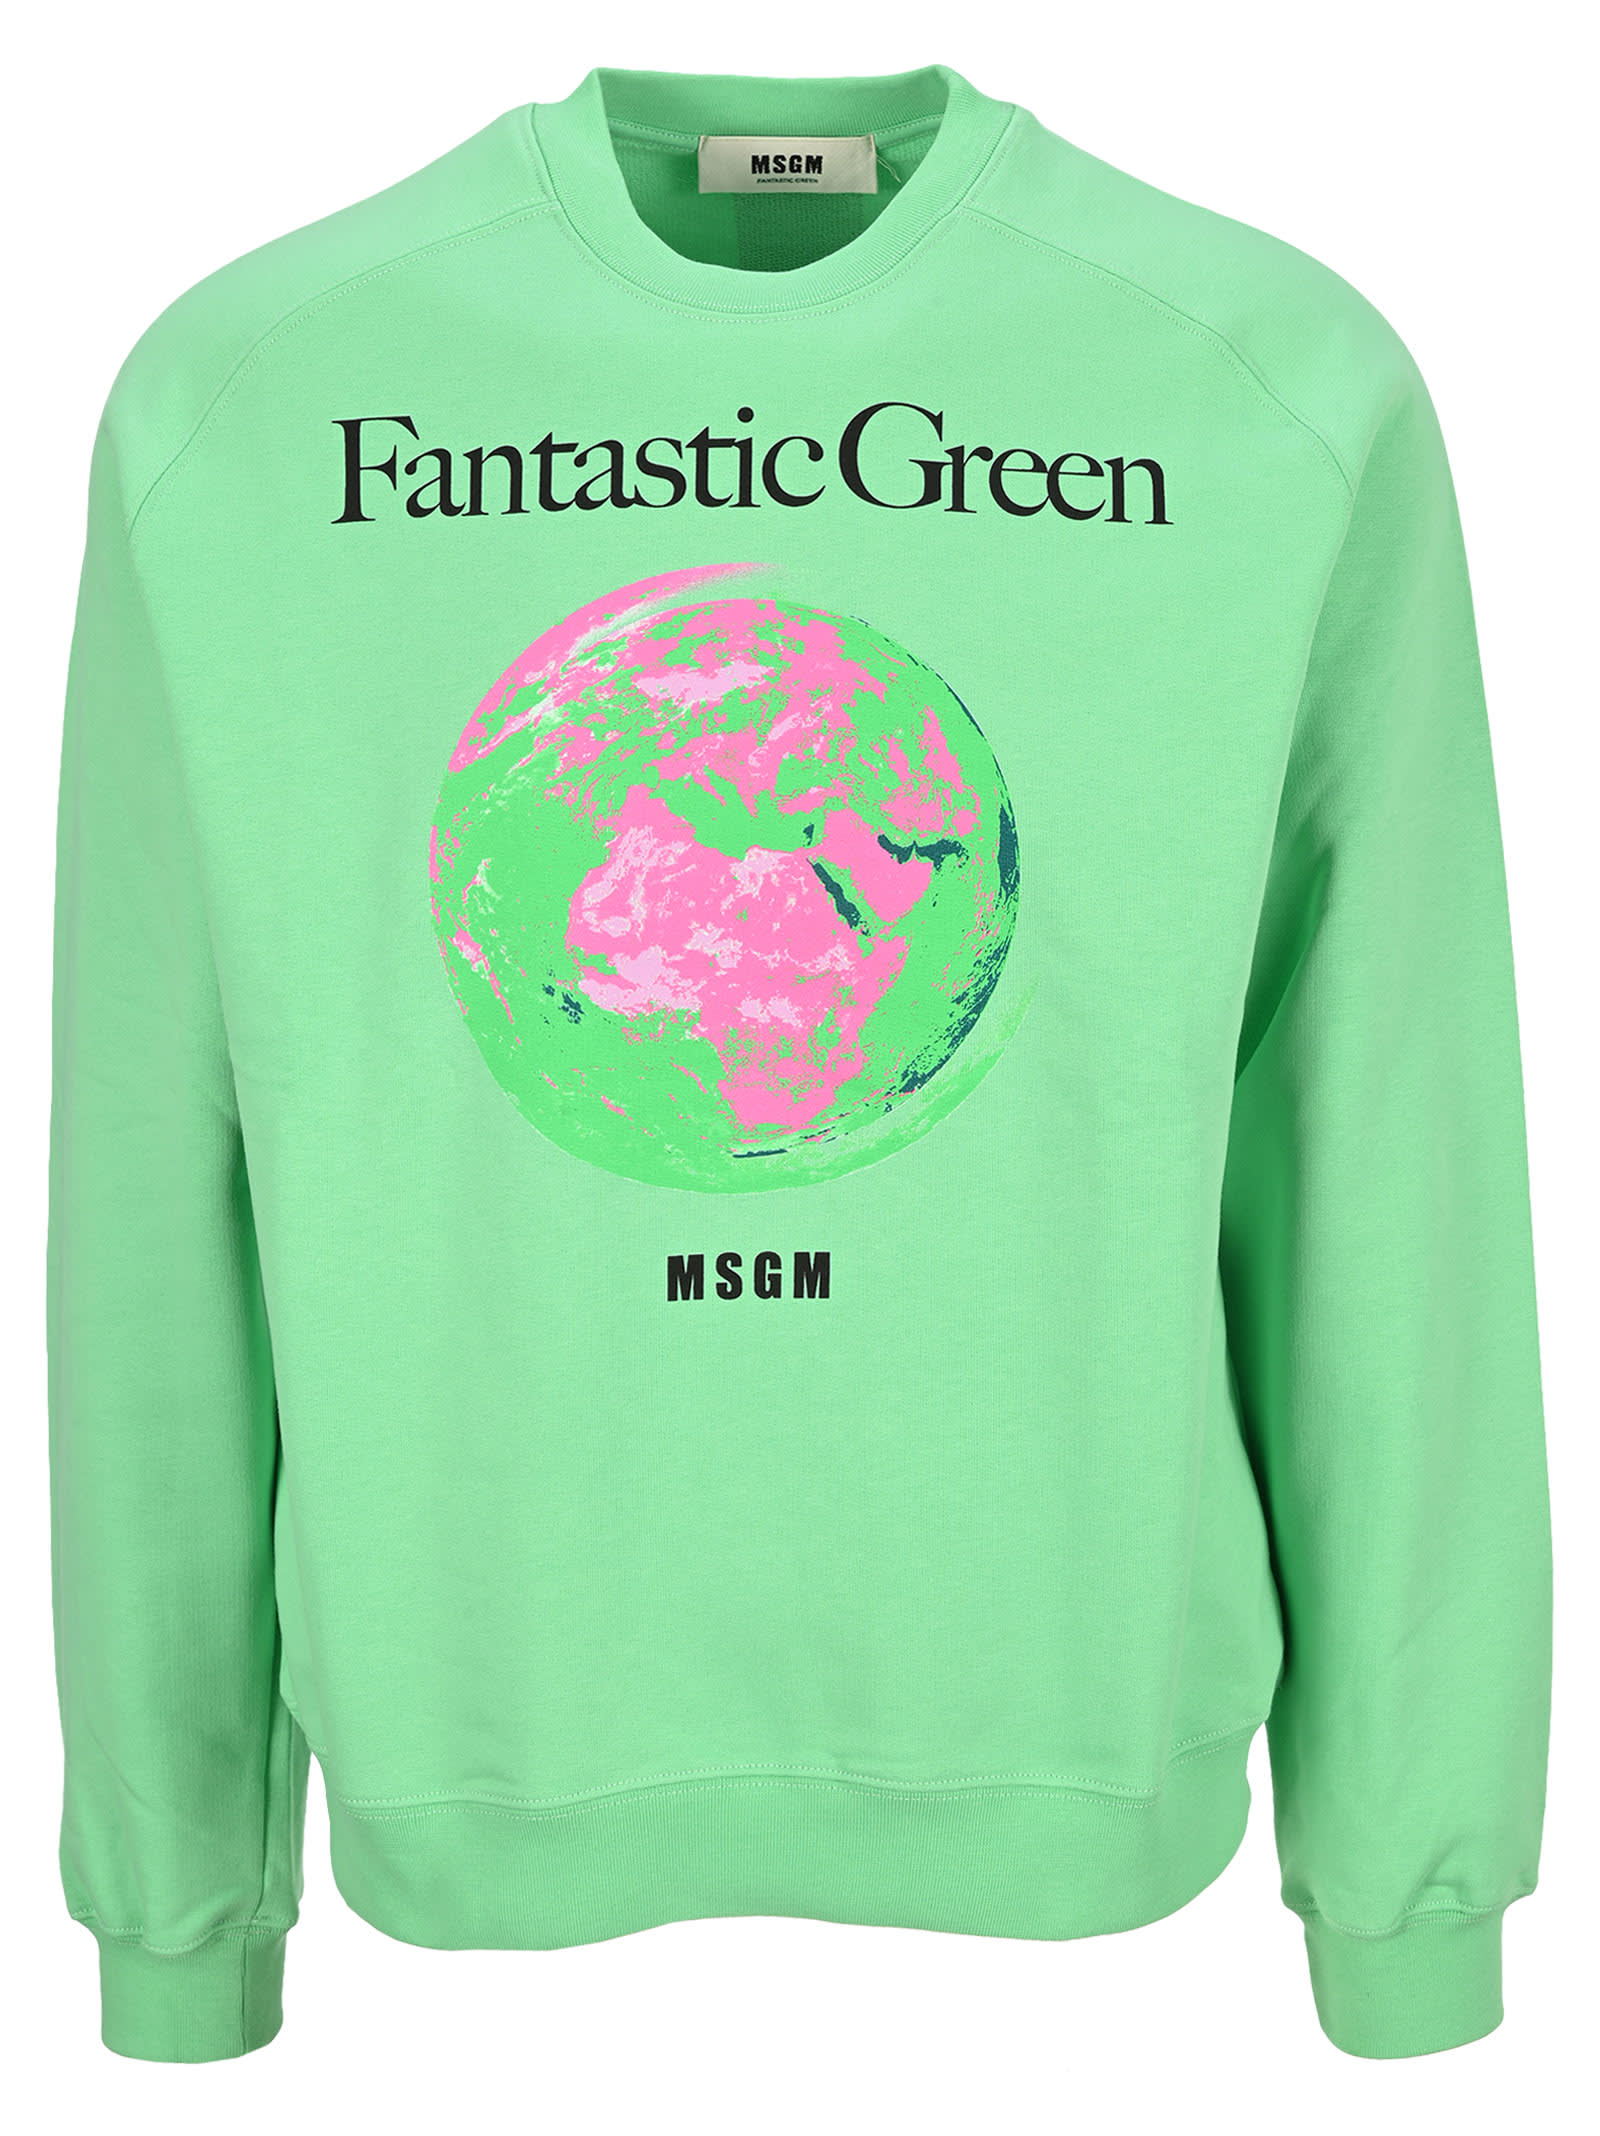 Msgm Cottons MSGM FANTASTIC GREEN SWEATSHIRT